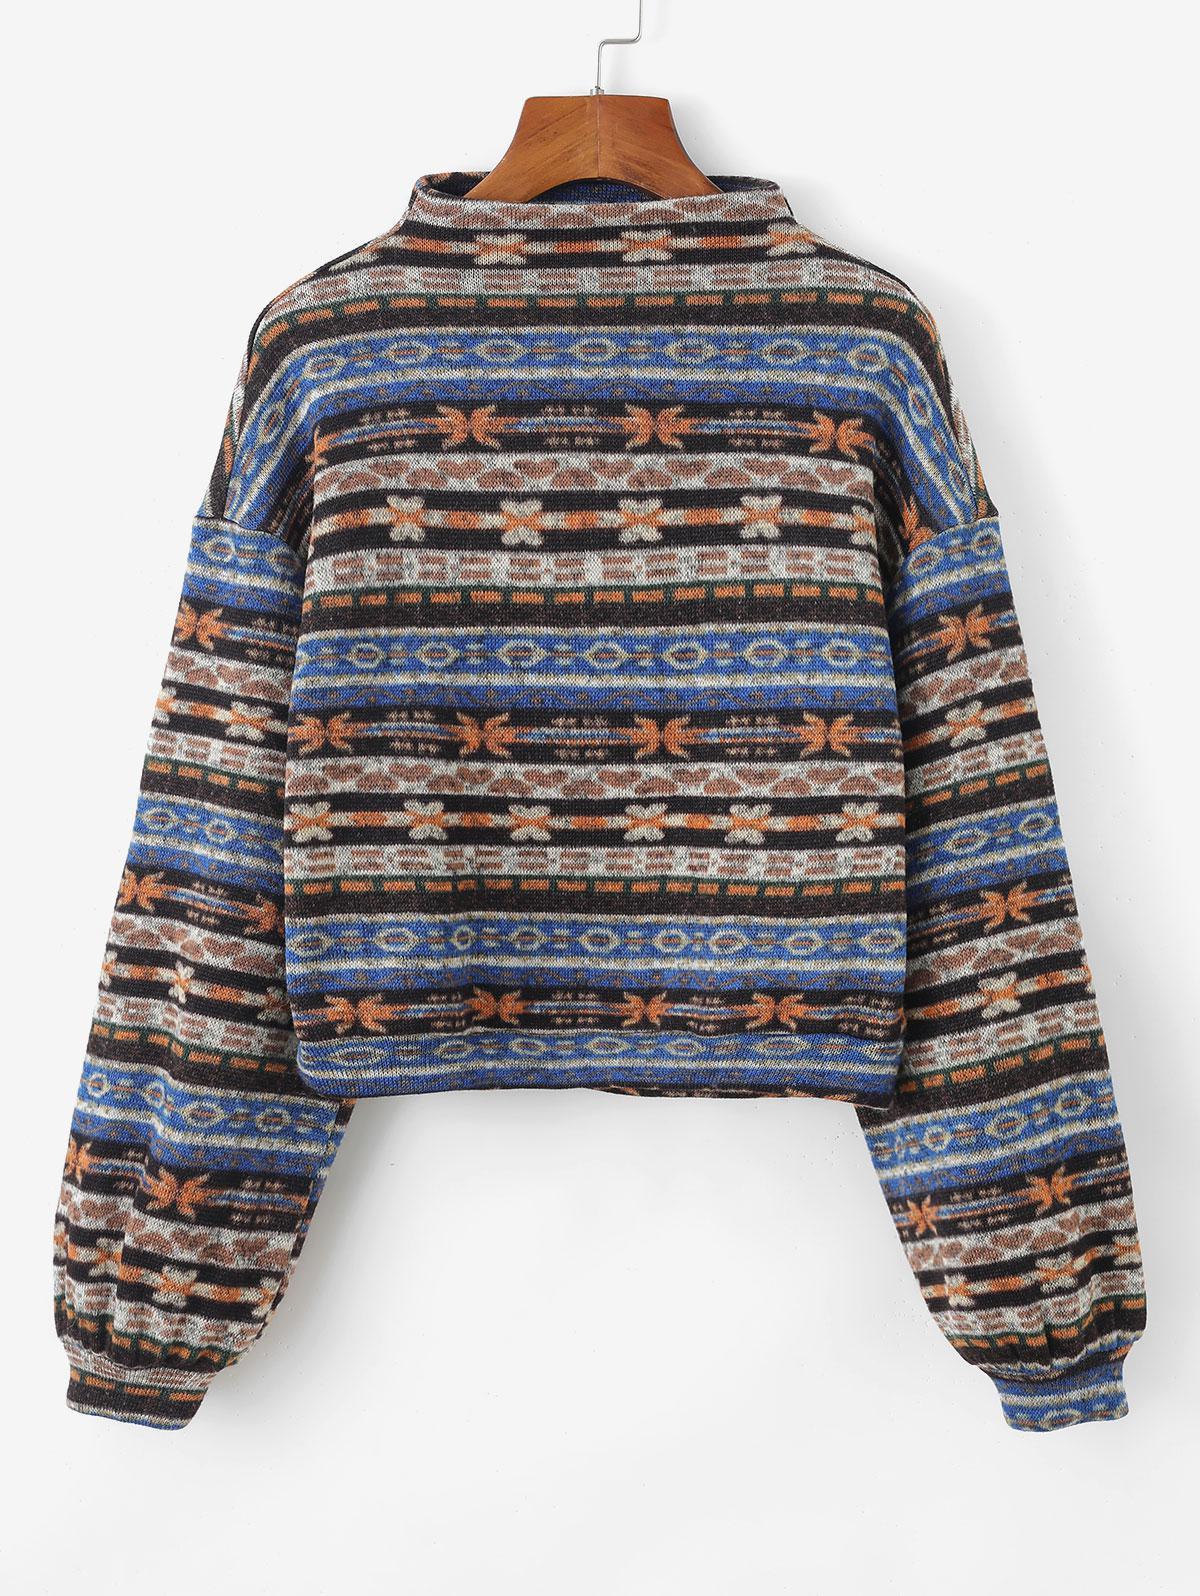 Sweat-shirt Tricoté Tribal Imprimé à Goutte Epaule - ZAFUL - Modalova